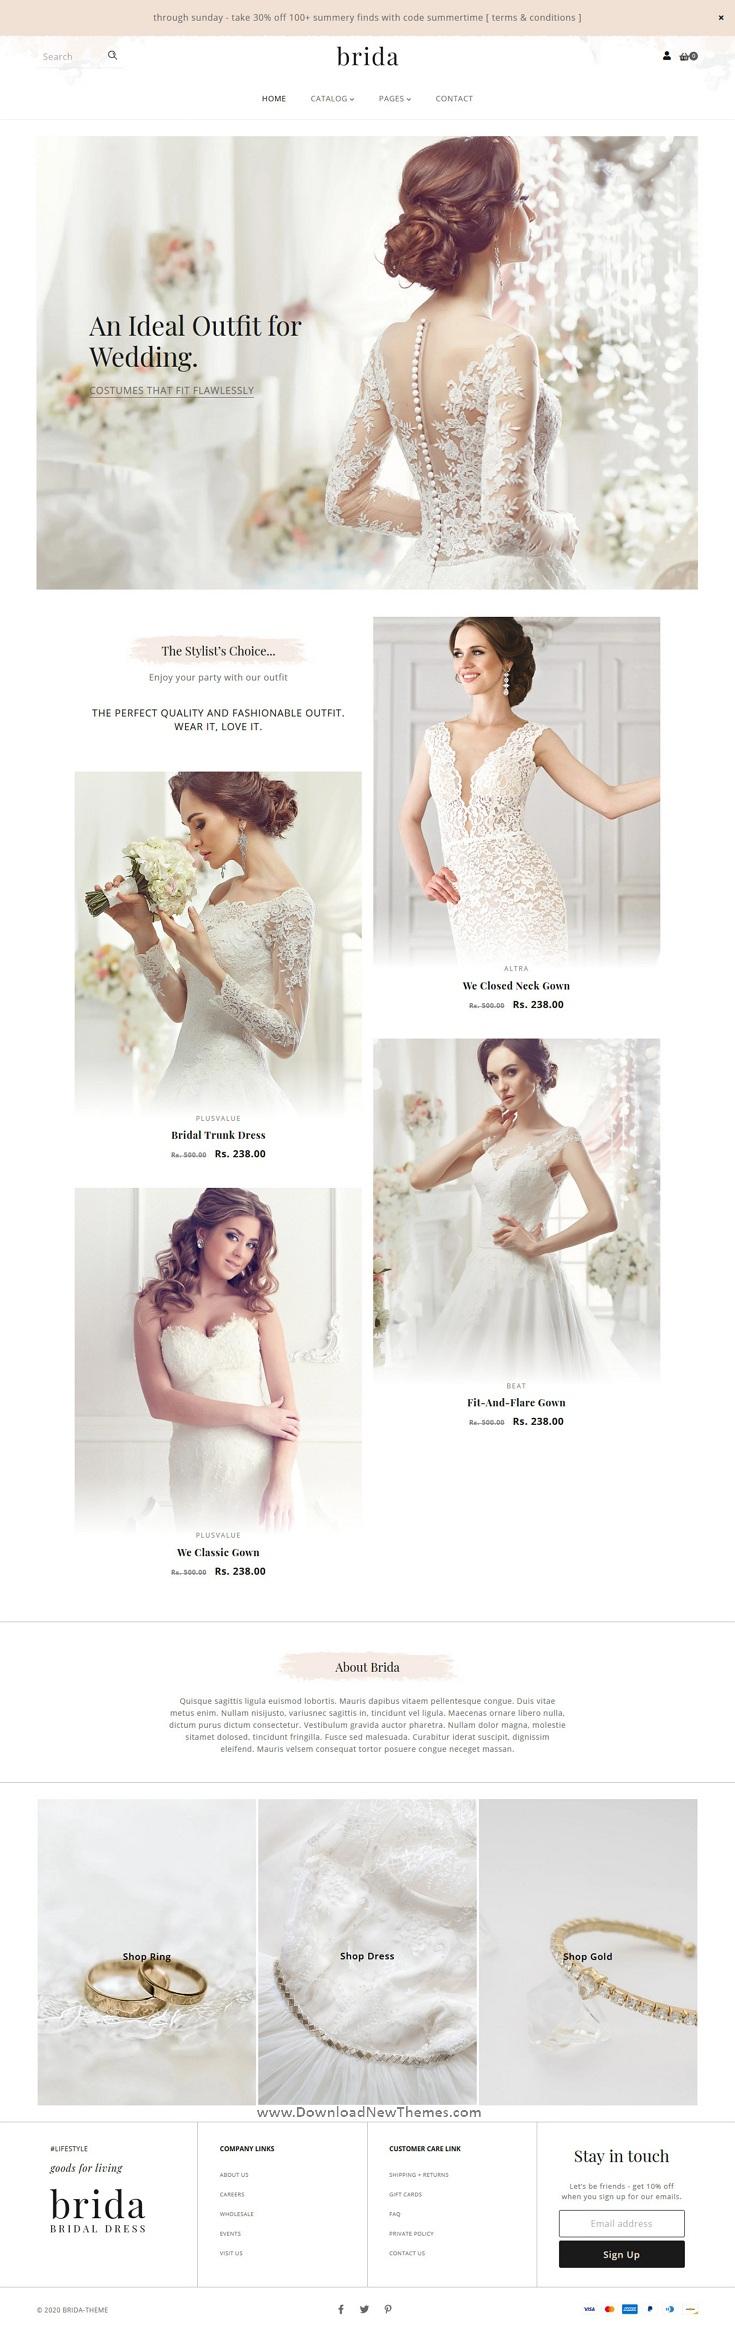 Wedding Fashion & Bridal Shop Shopify Theme